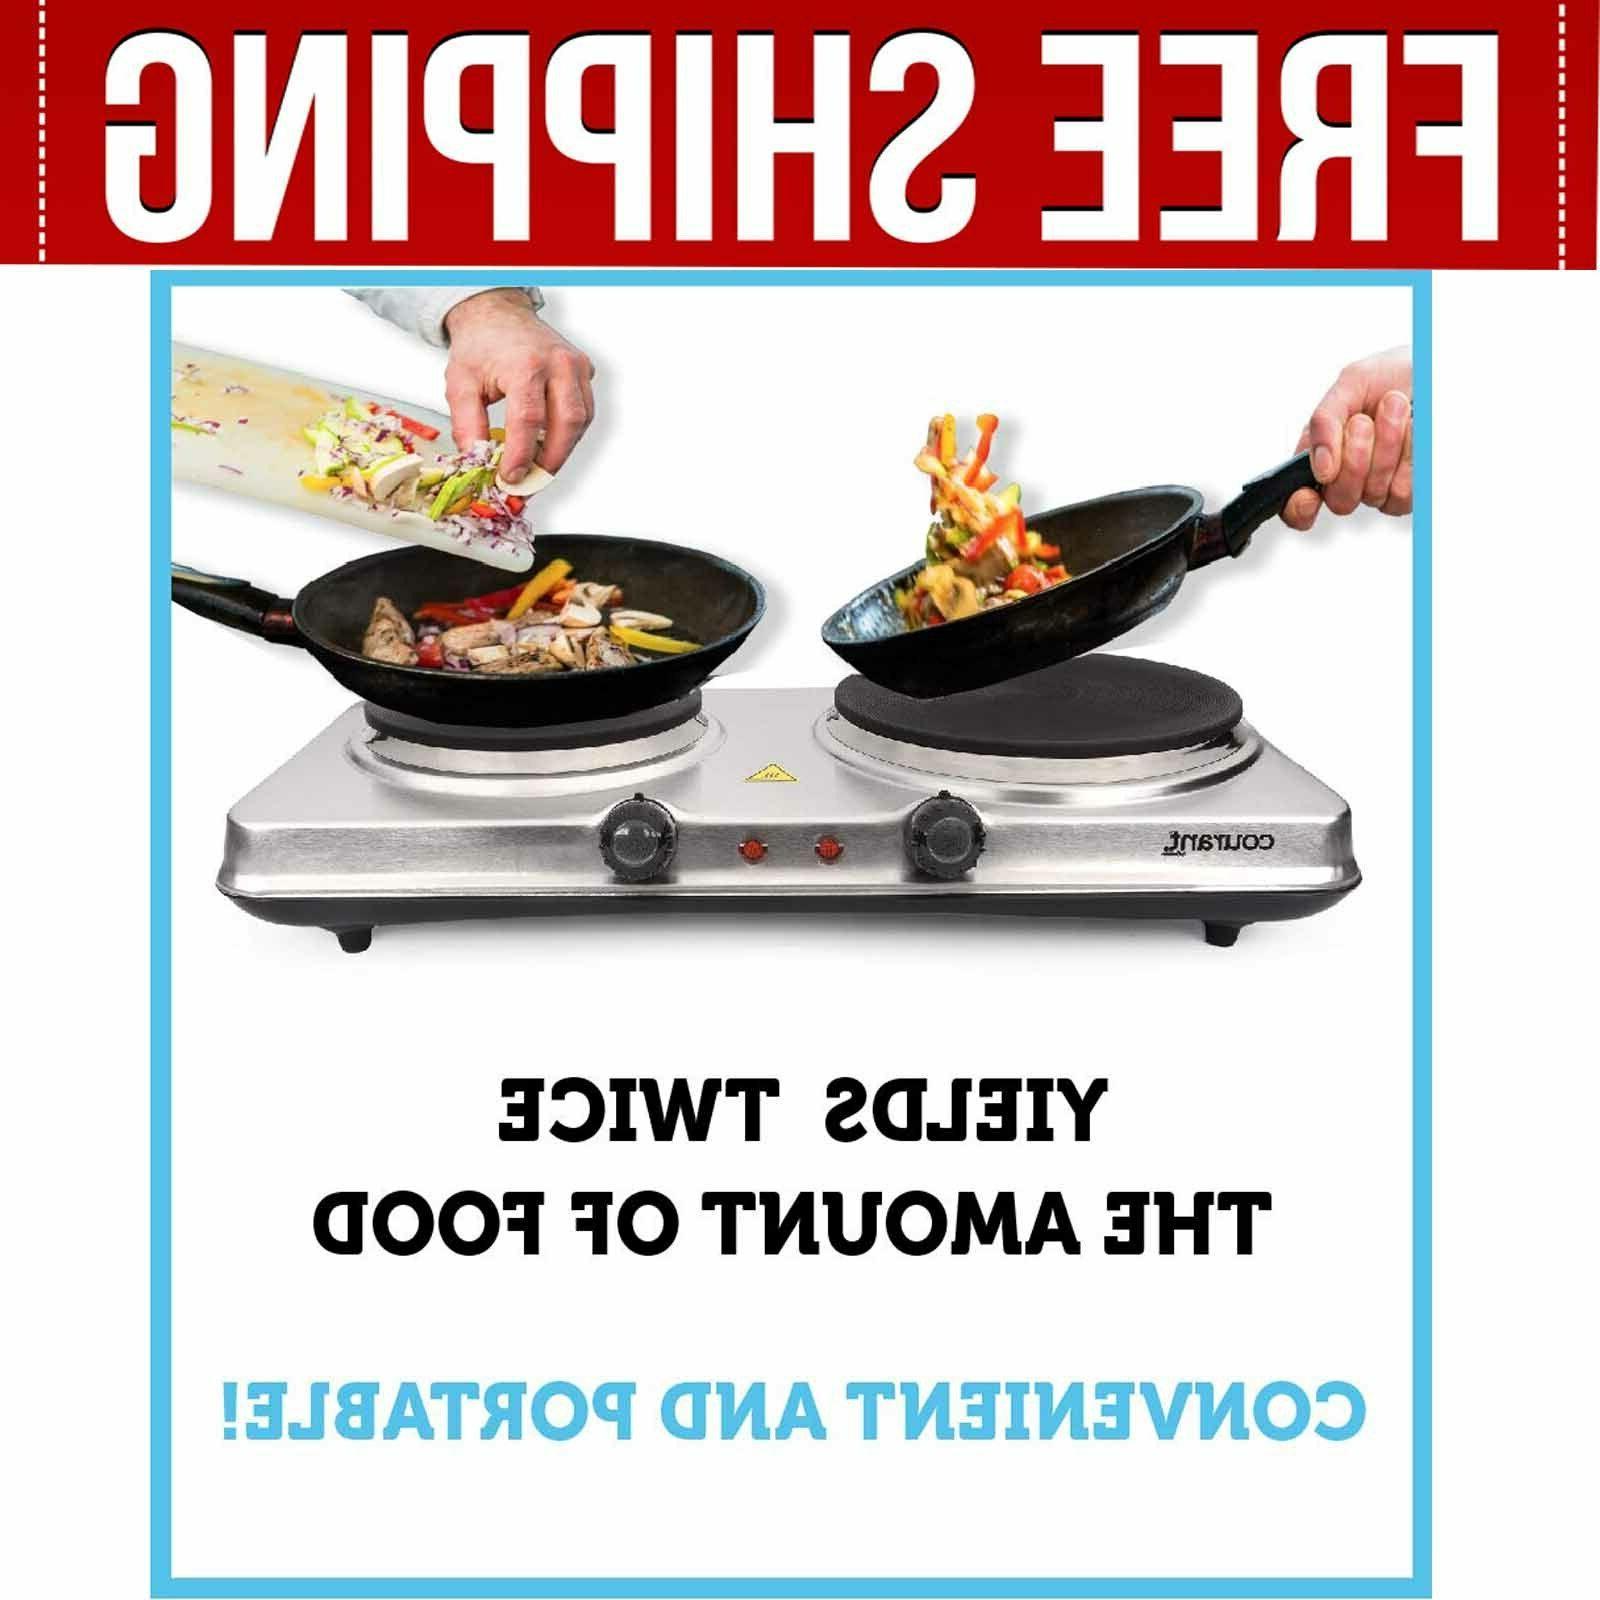 Electric Cooktop Burner Hot Plate Burners Stove